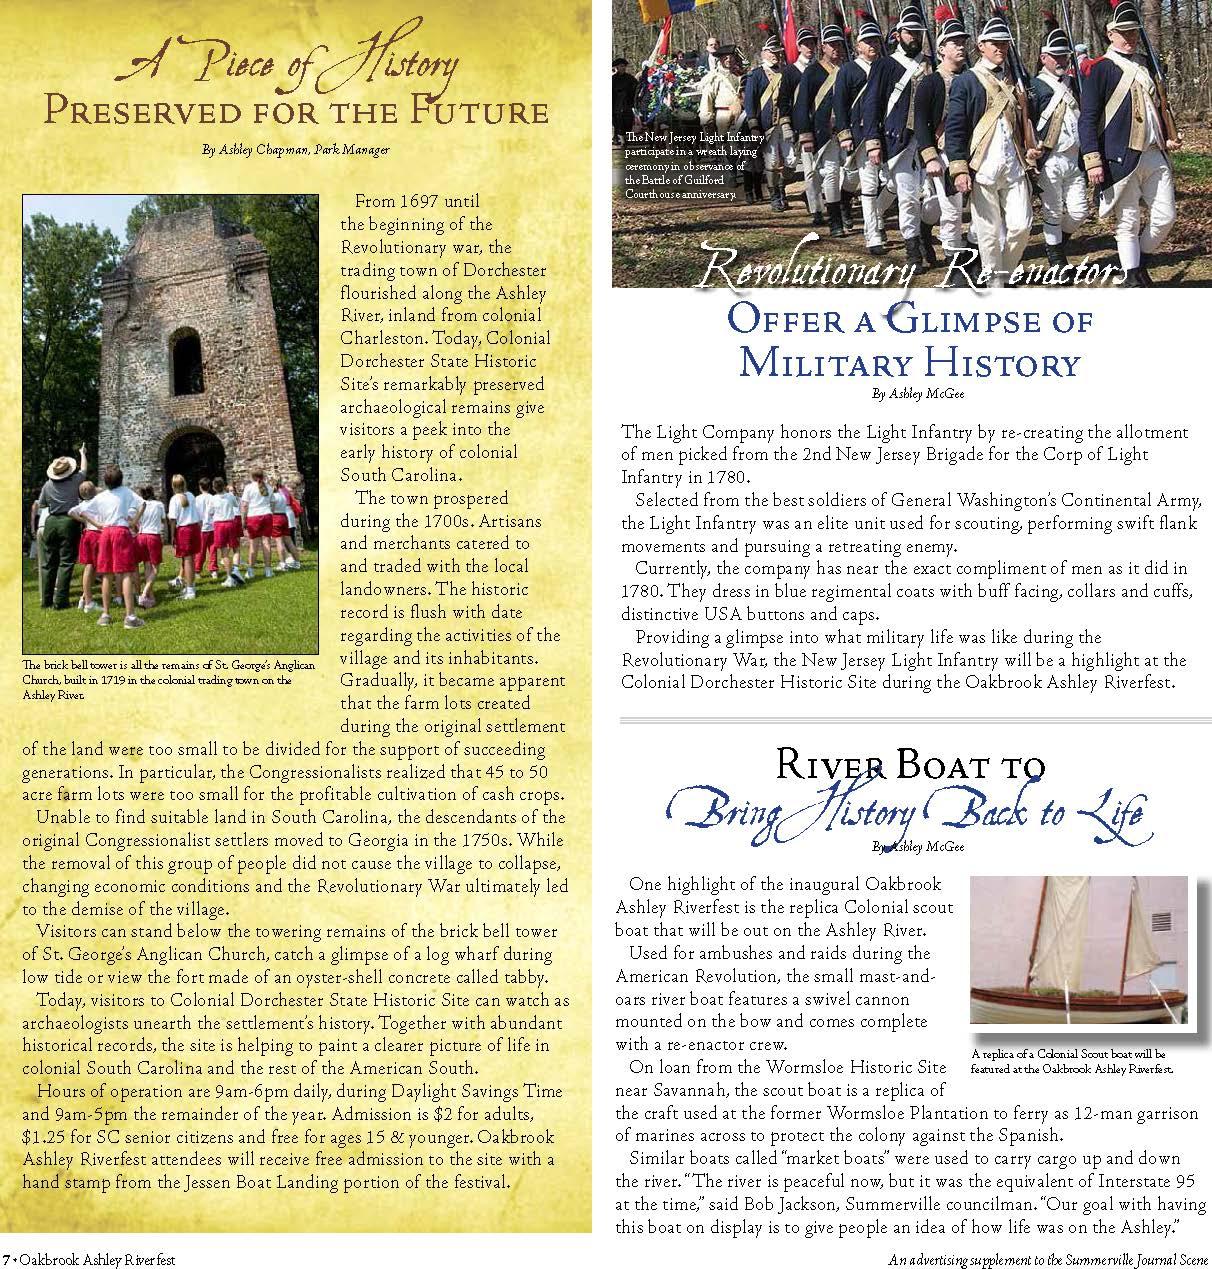 oakbrook-riverfest2_page_5.jpg